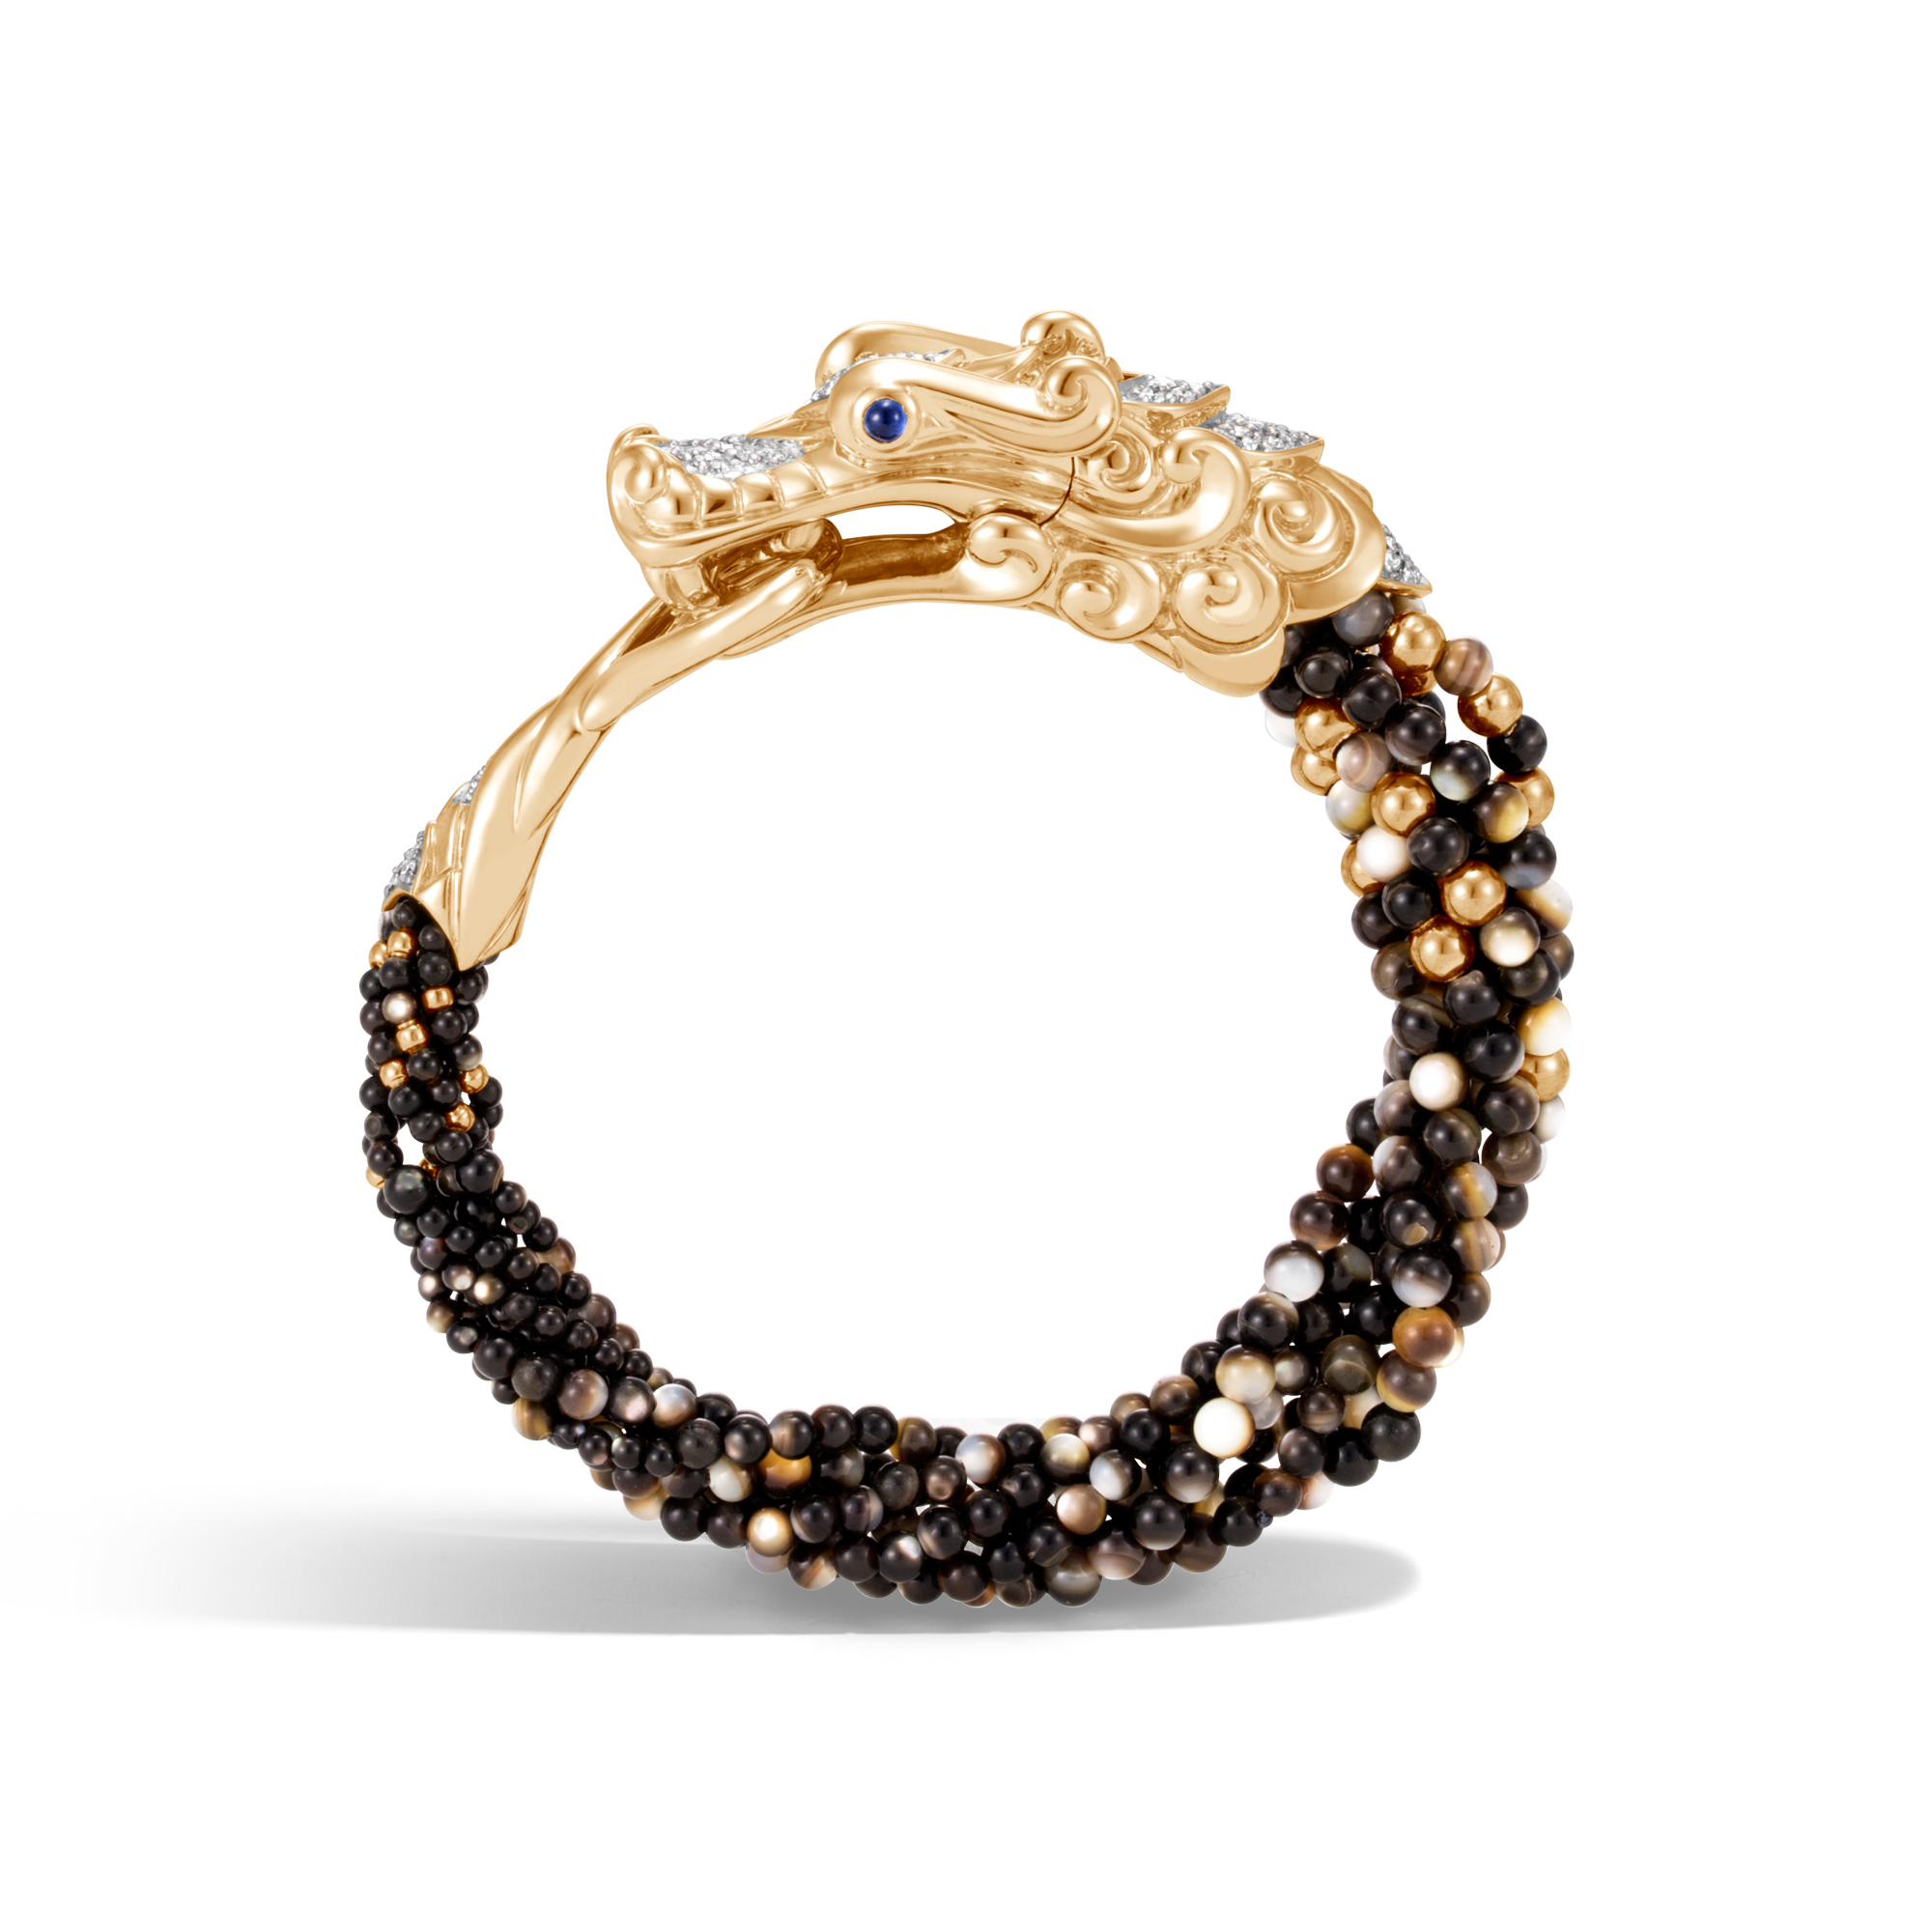 Legends Naga Multi Row Bracelet, 18K Gold, Gemstone and Dia, White Diamond, large